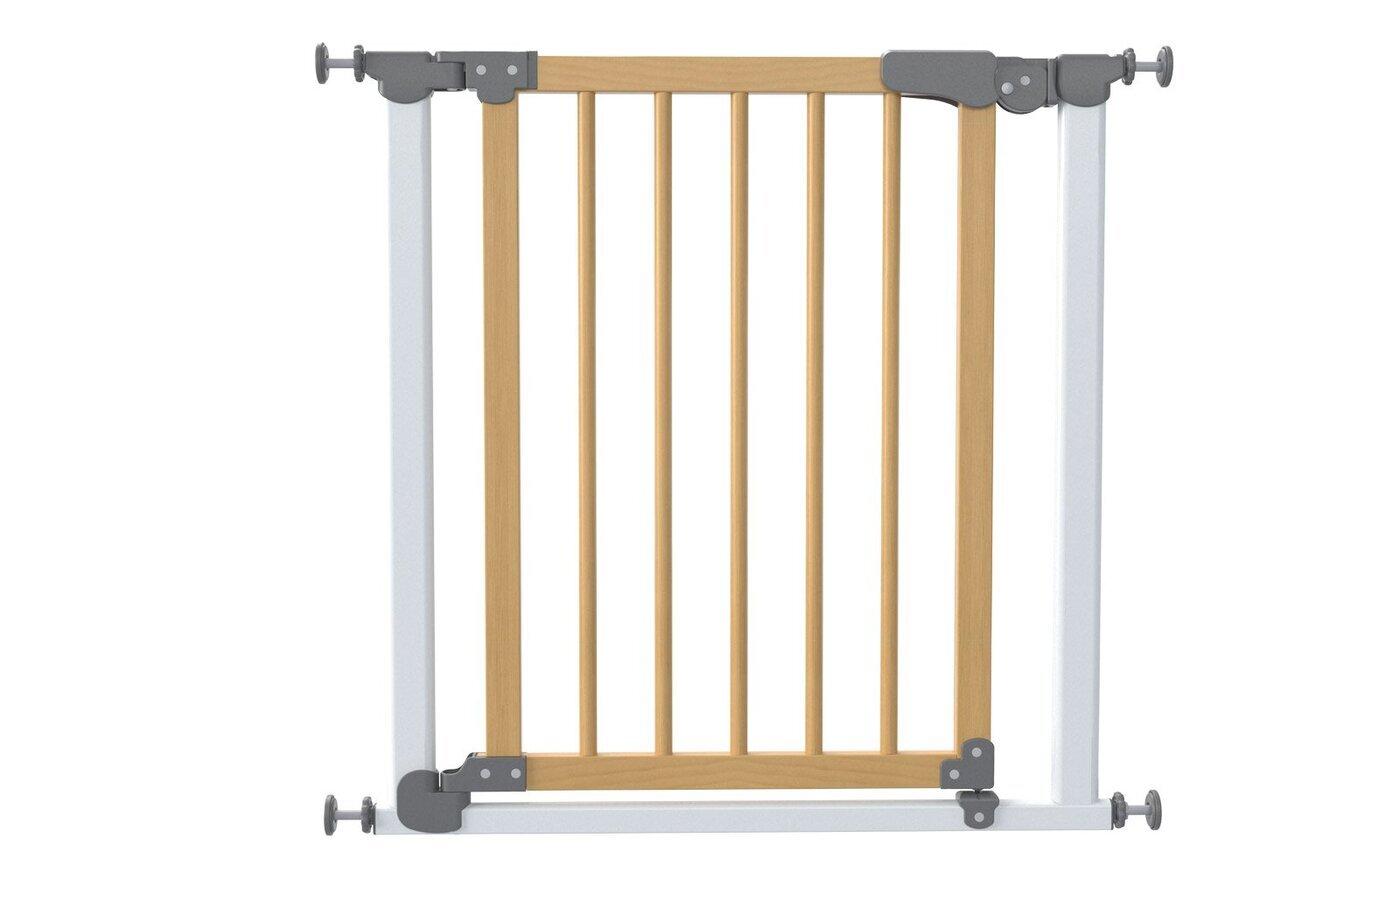 Ворота безопасности на распорках без доводчика Проем 82,5 - 90 cм, Safe & Care Дерево